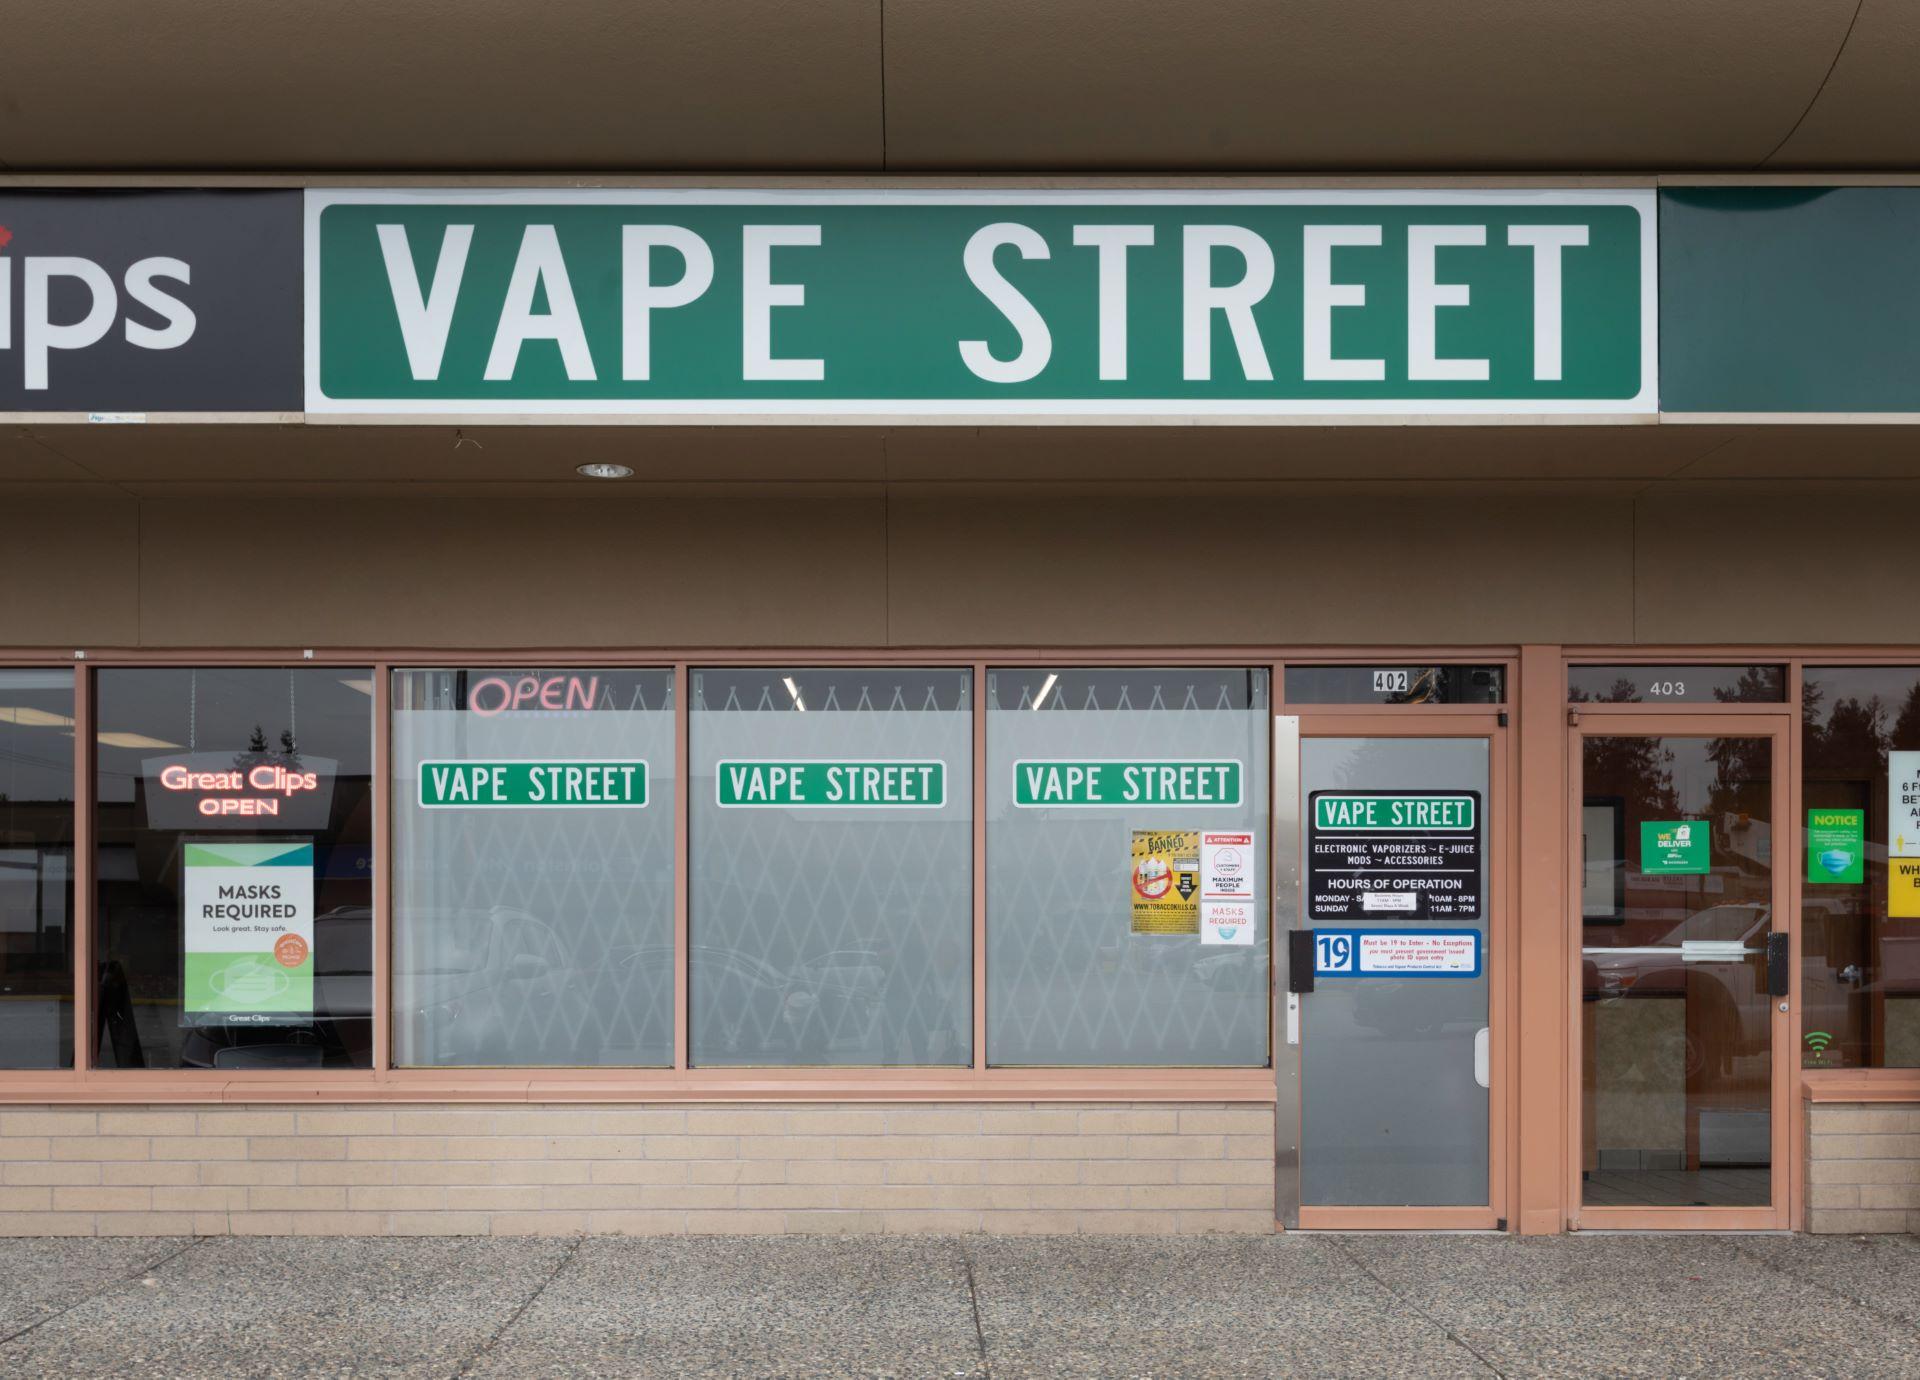 vape street westwood lougheed